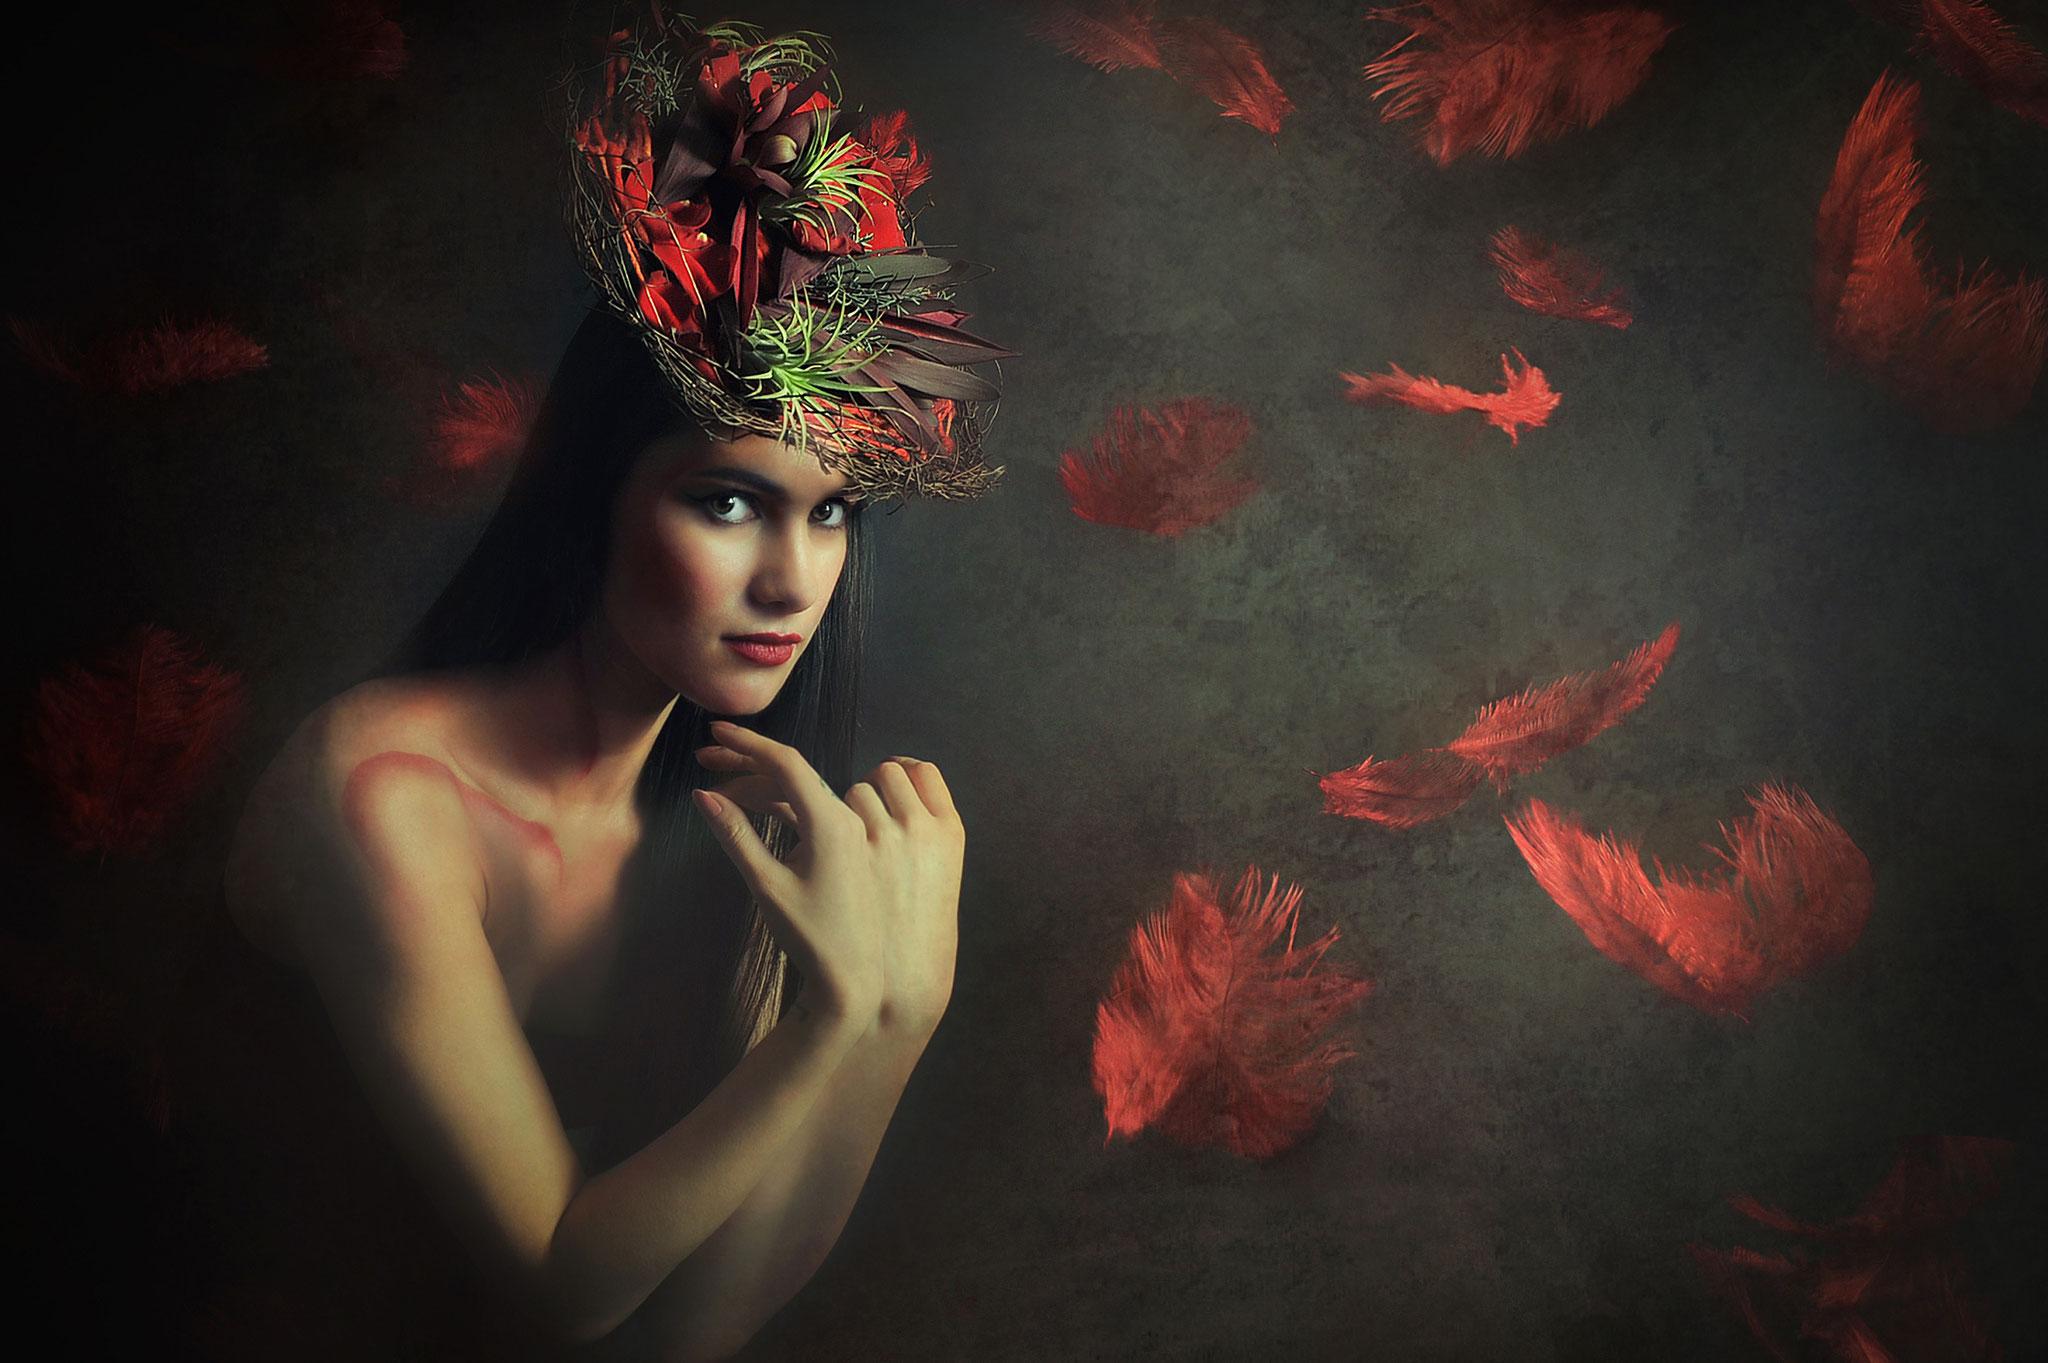 Rusu Adela Lia EFIAPb (Romania) - Red Rain